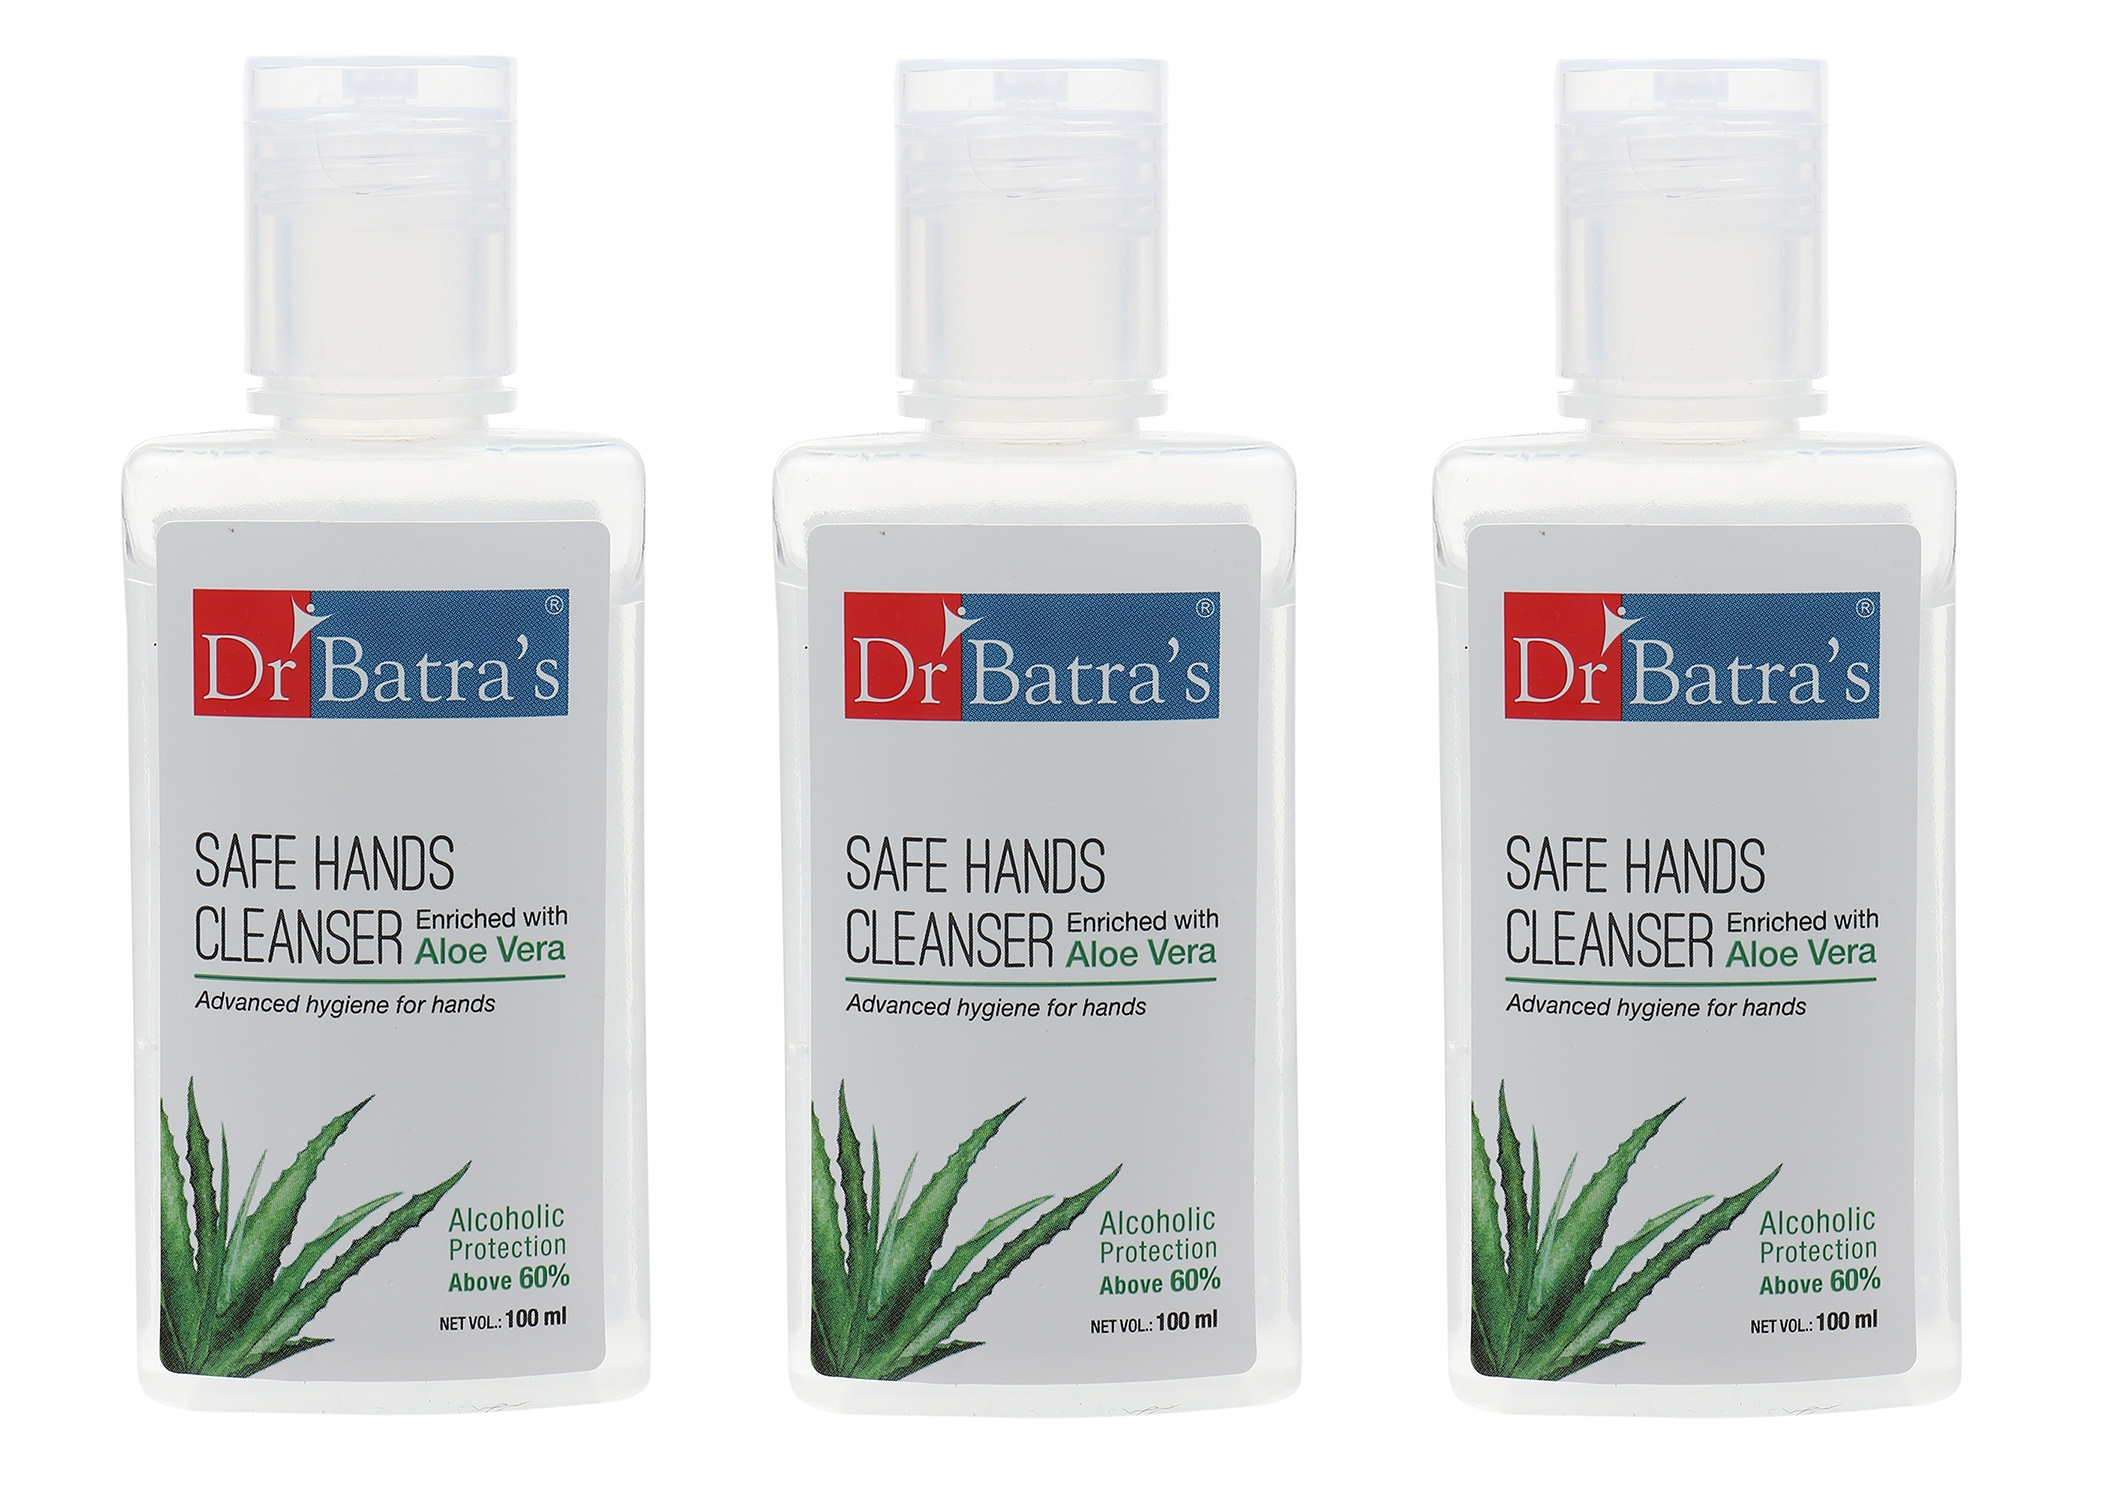 Dr Batra's | Dr Batra's Safe Hands Cleanser Enriched With Aloe vera - 100 ml (Pack of 3)